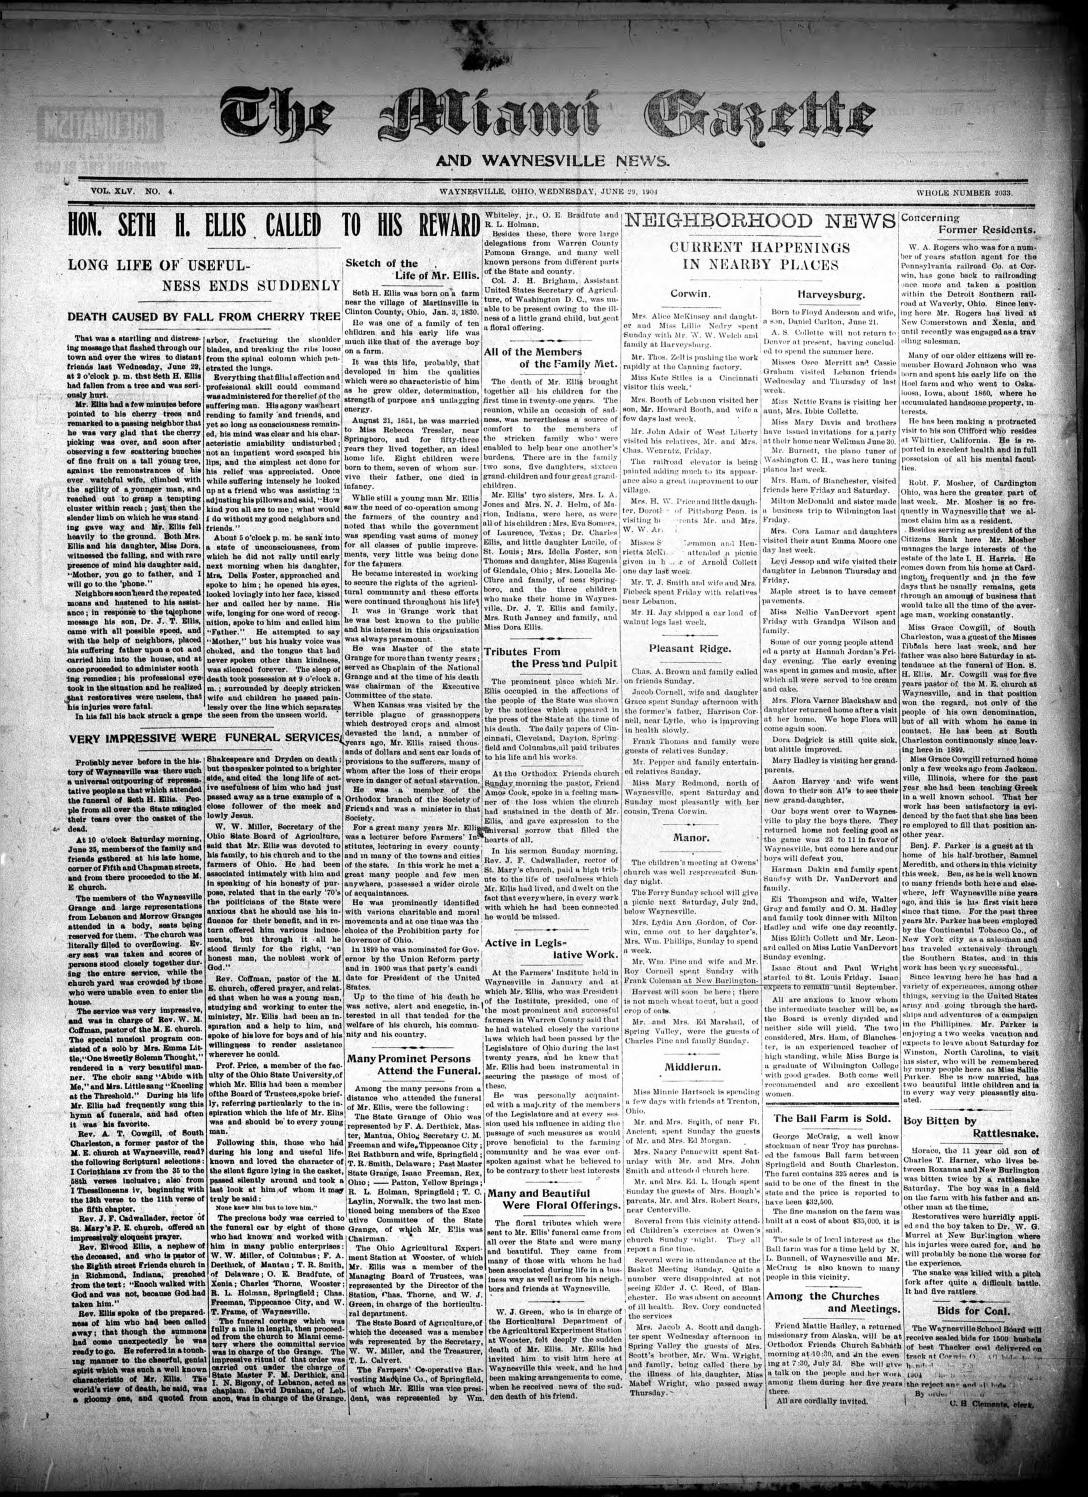 Miami Gazette January 6 1904 June 22 1904 by marylcook